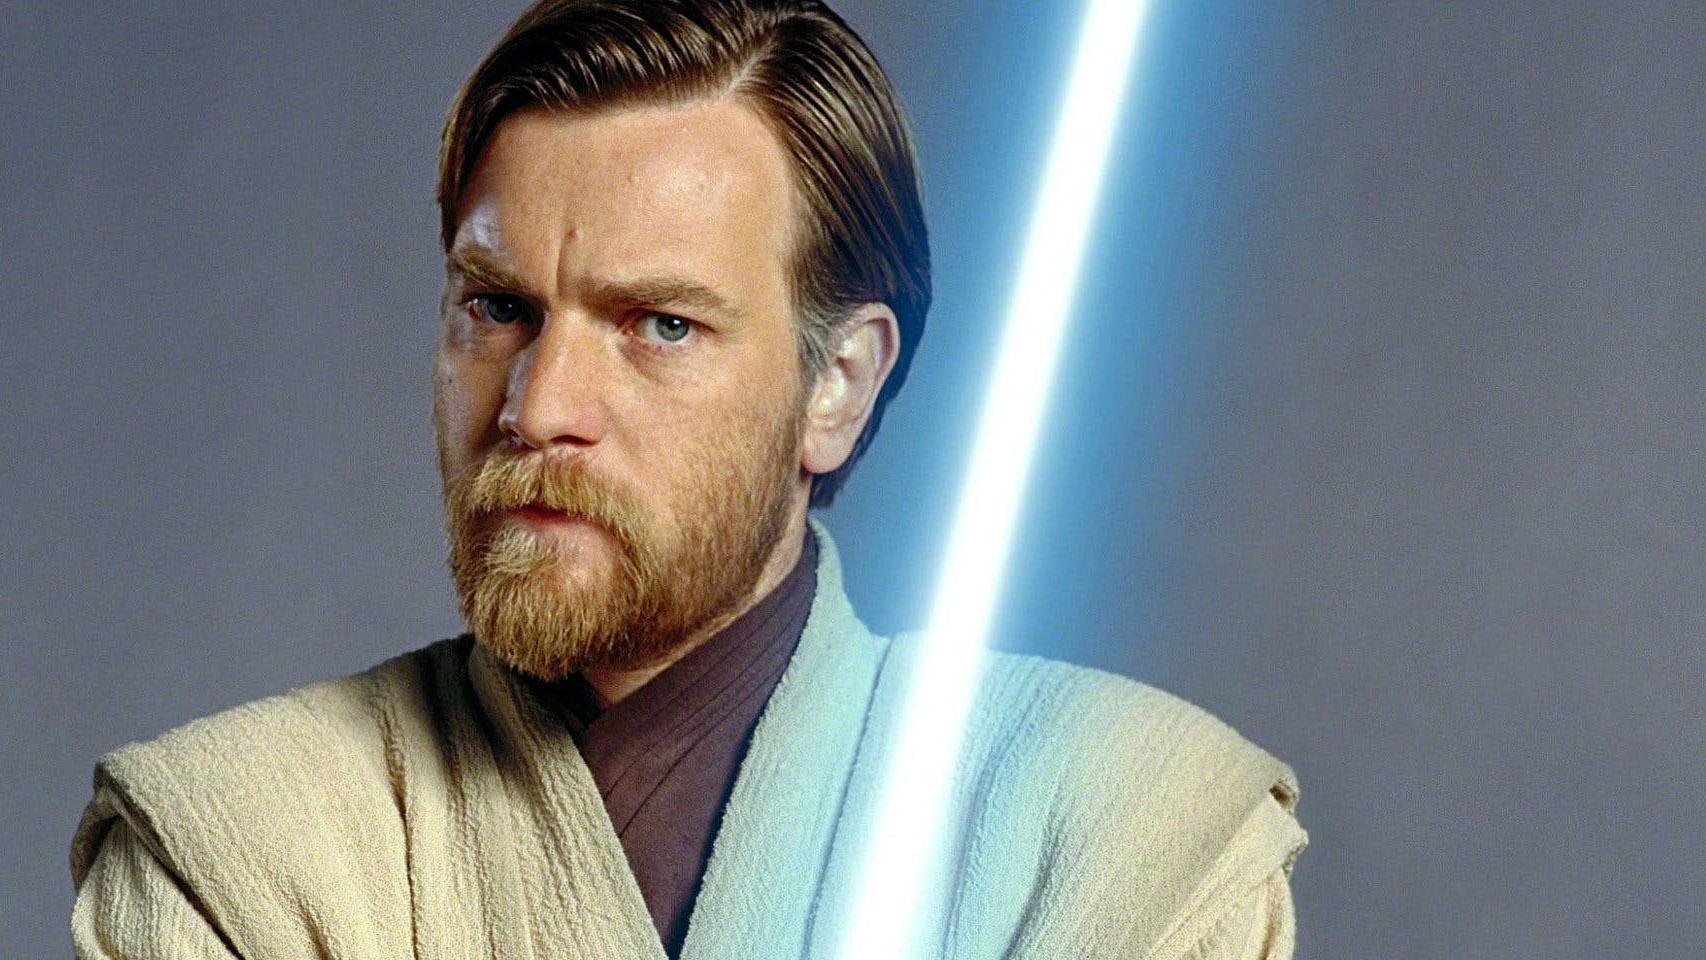 Nessuno spin-off in vista per Obi-Wan Kenobi secondo Ewan McGregor thumbnail